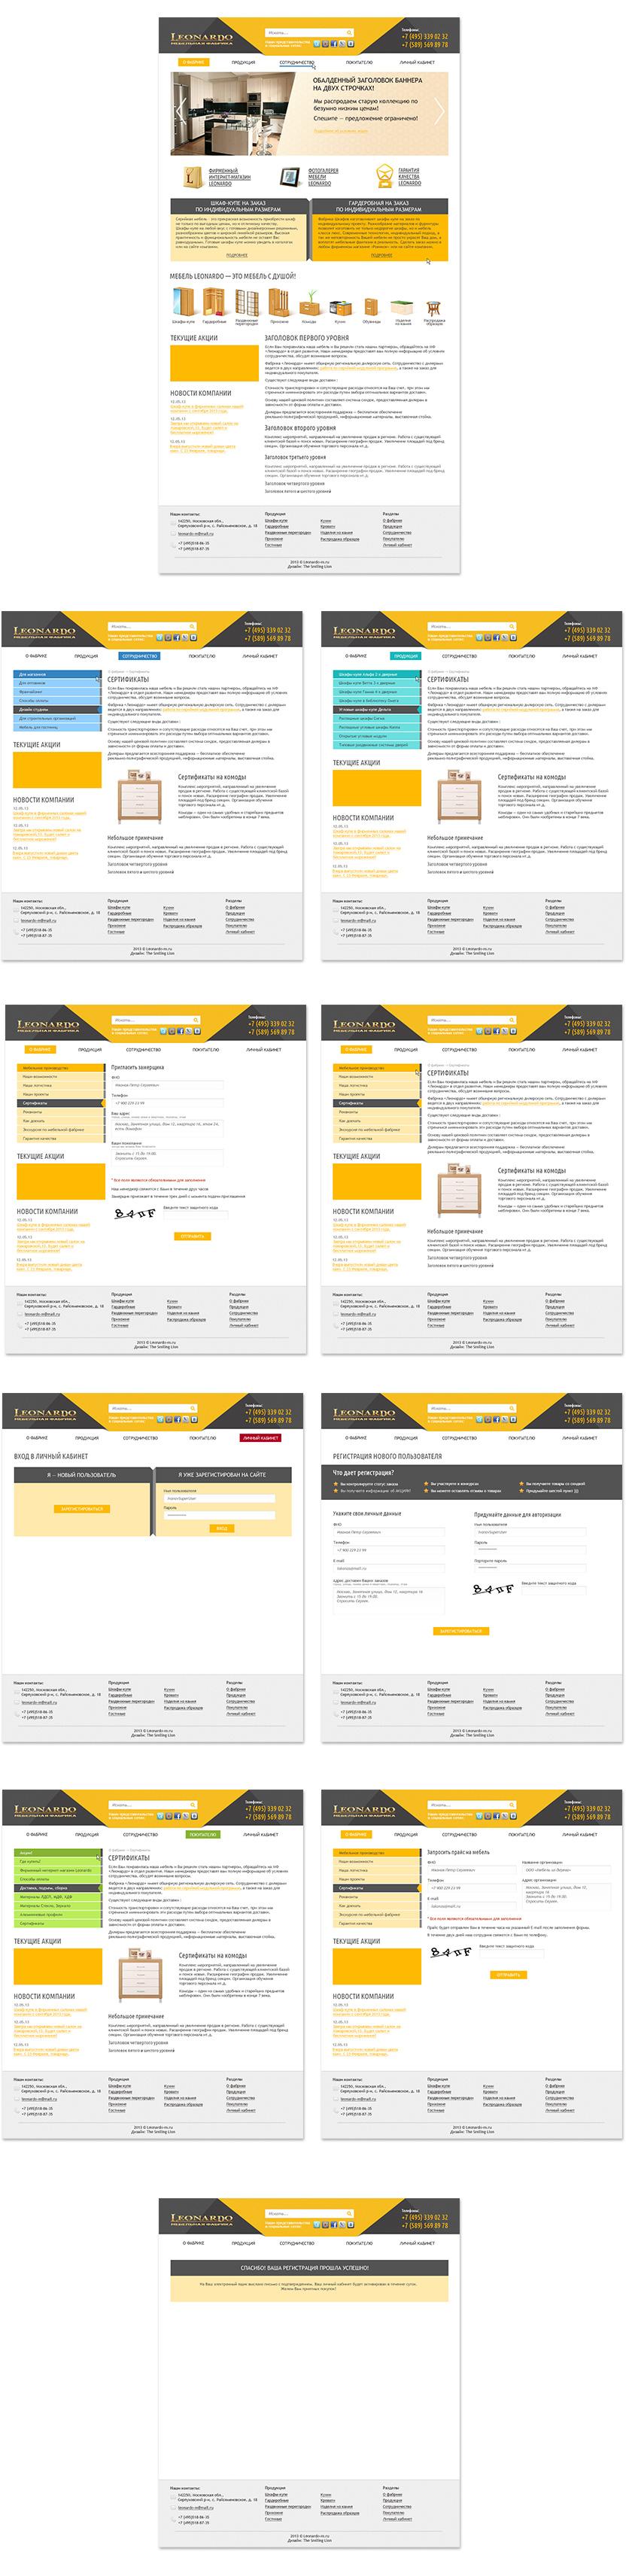 Структура страниц сайта